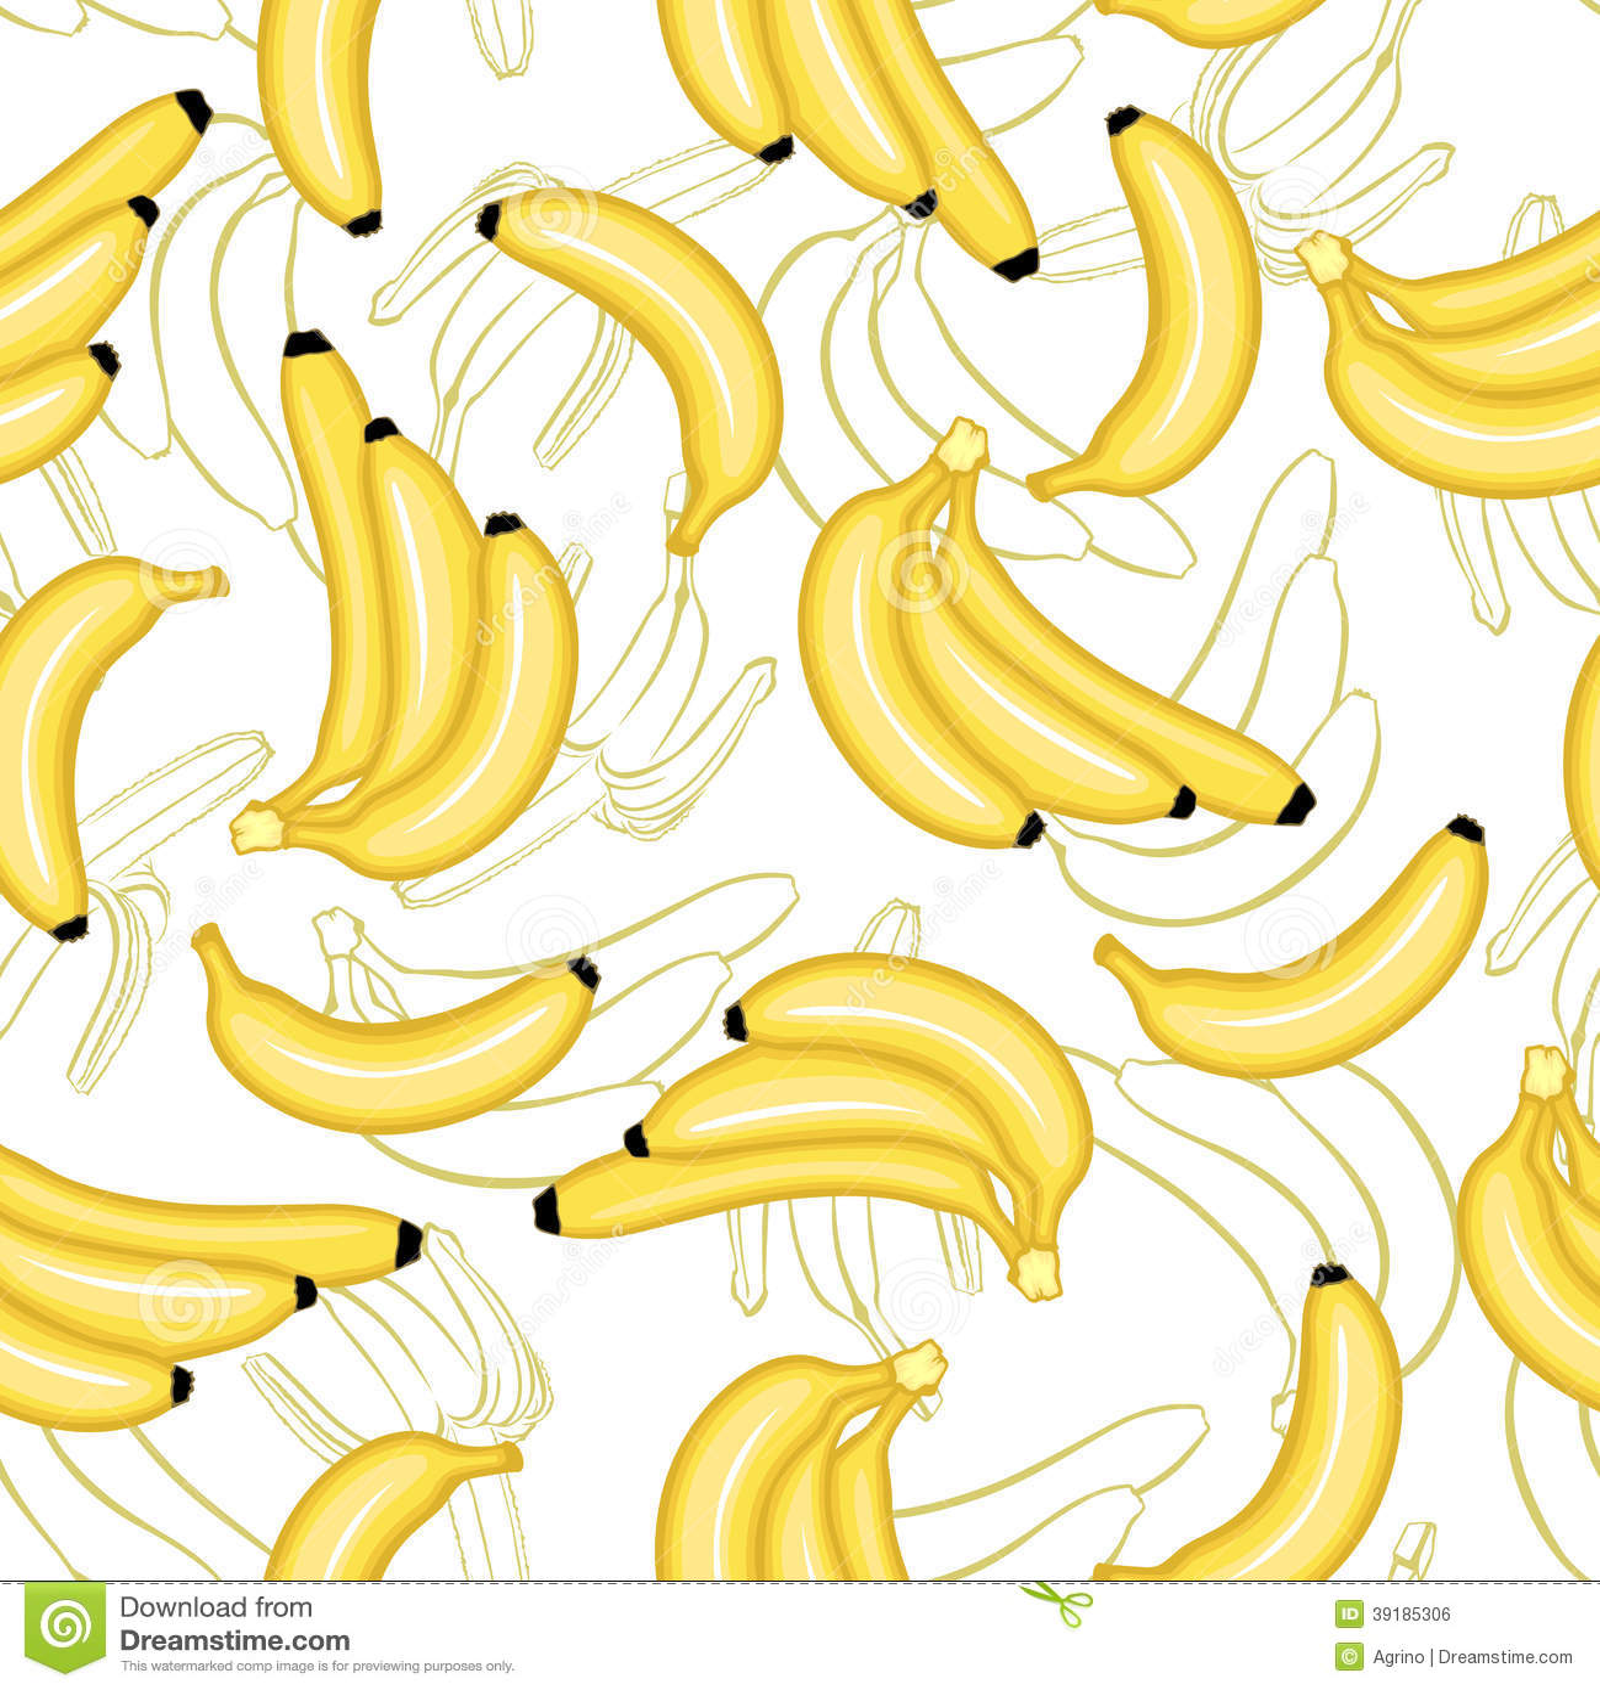 Bananas Fruit Pattern Seamless Stock Vector - Image: 39185306